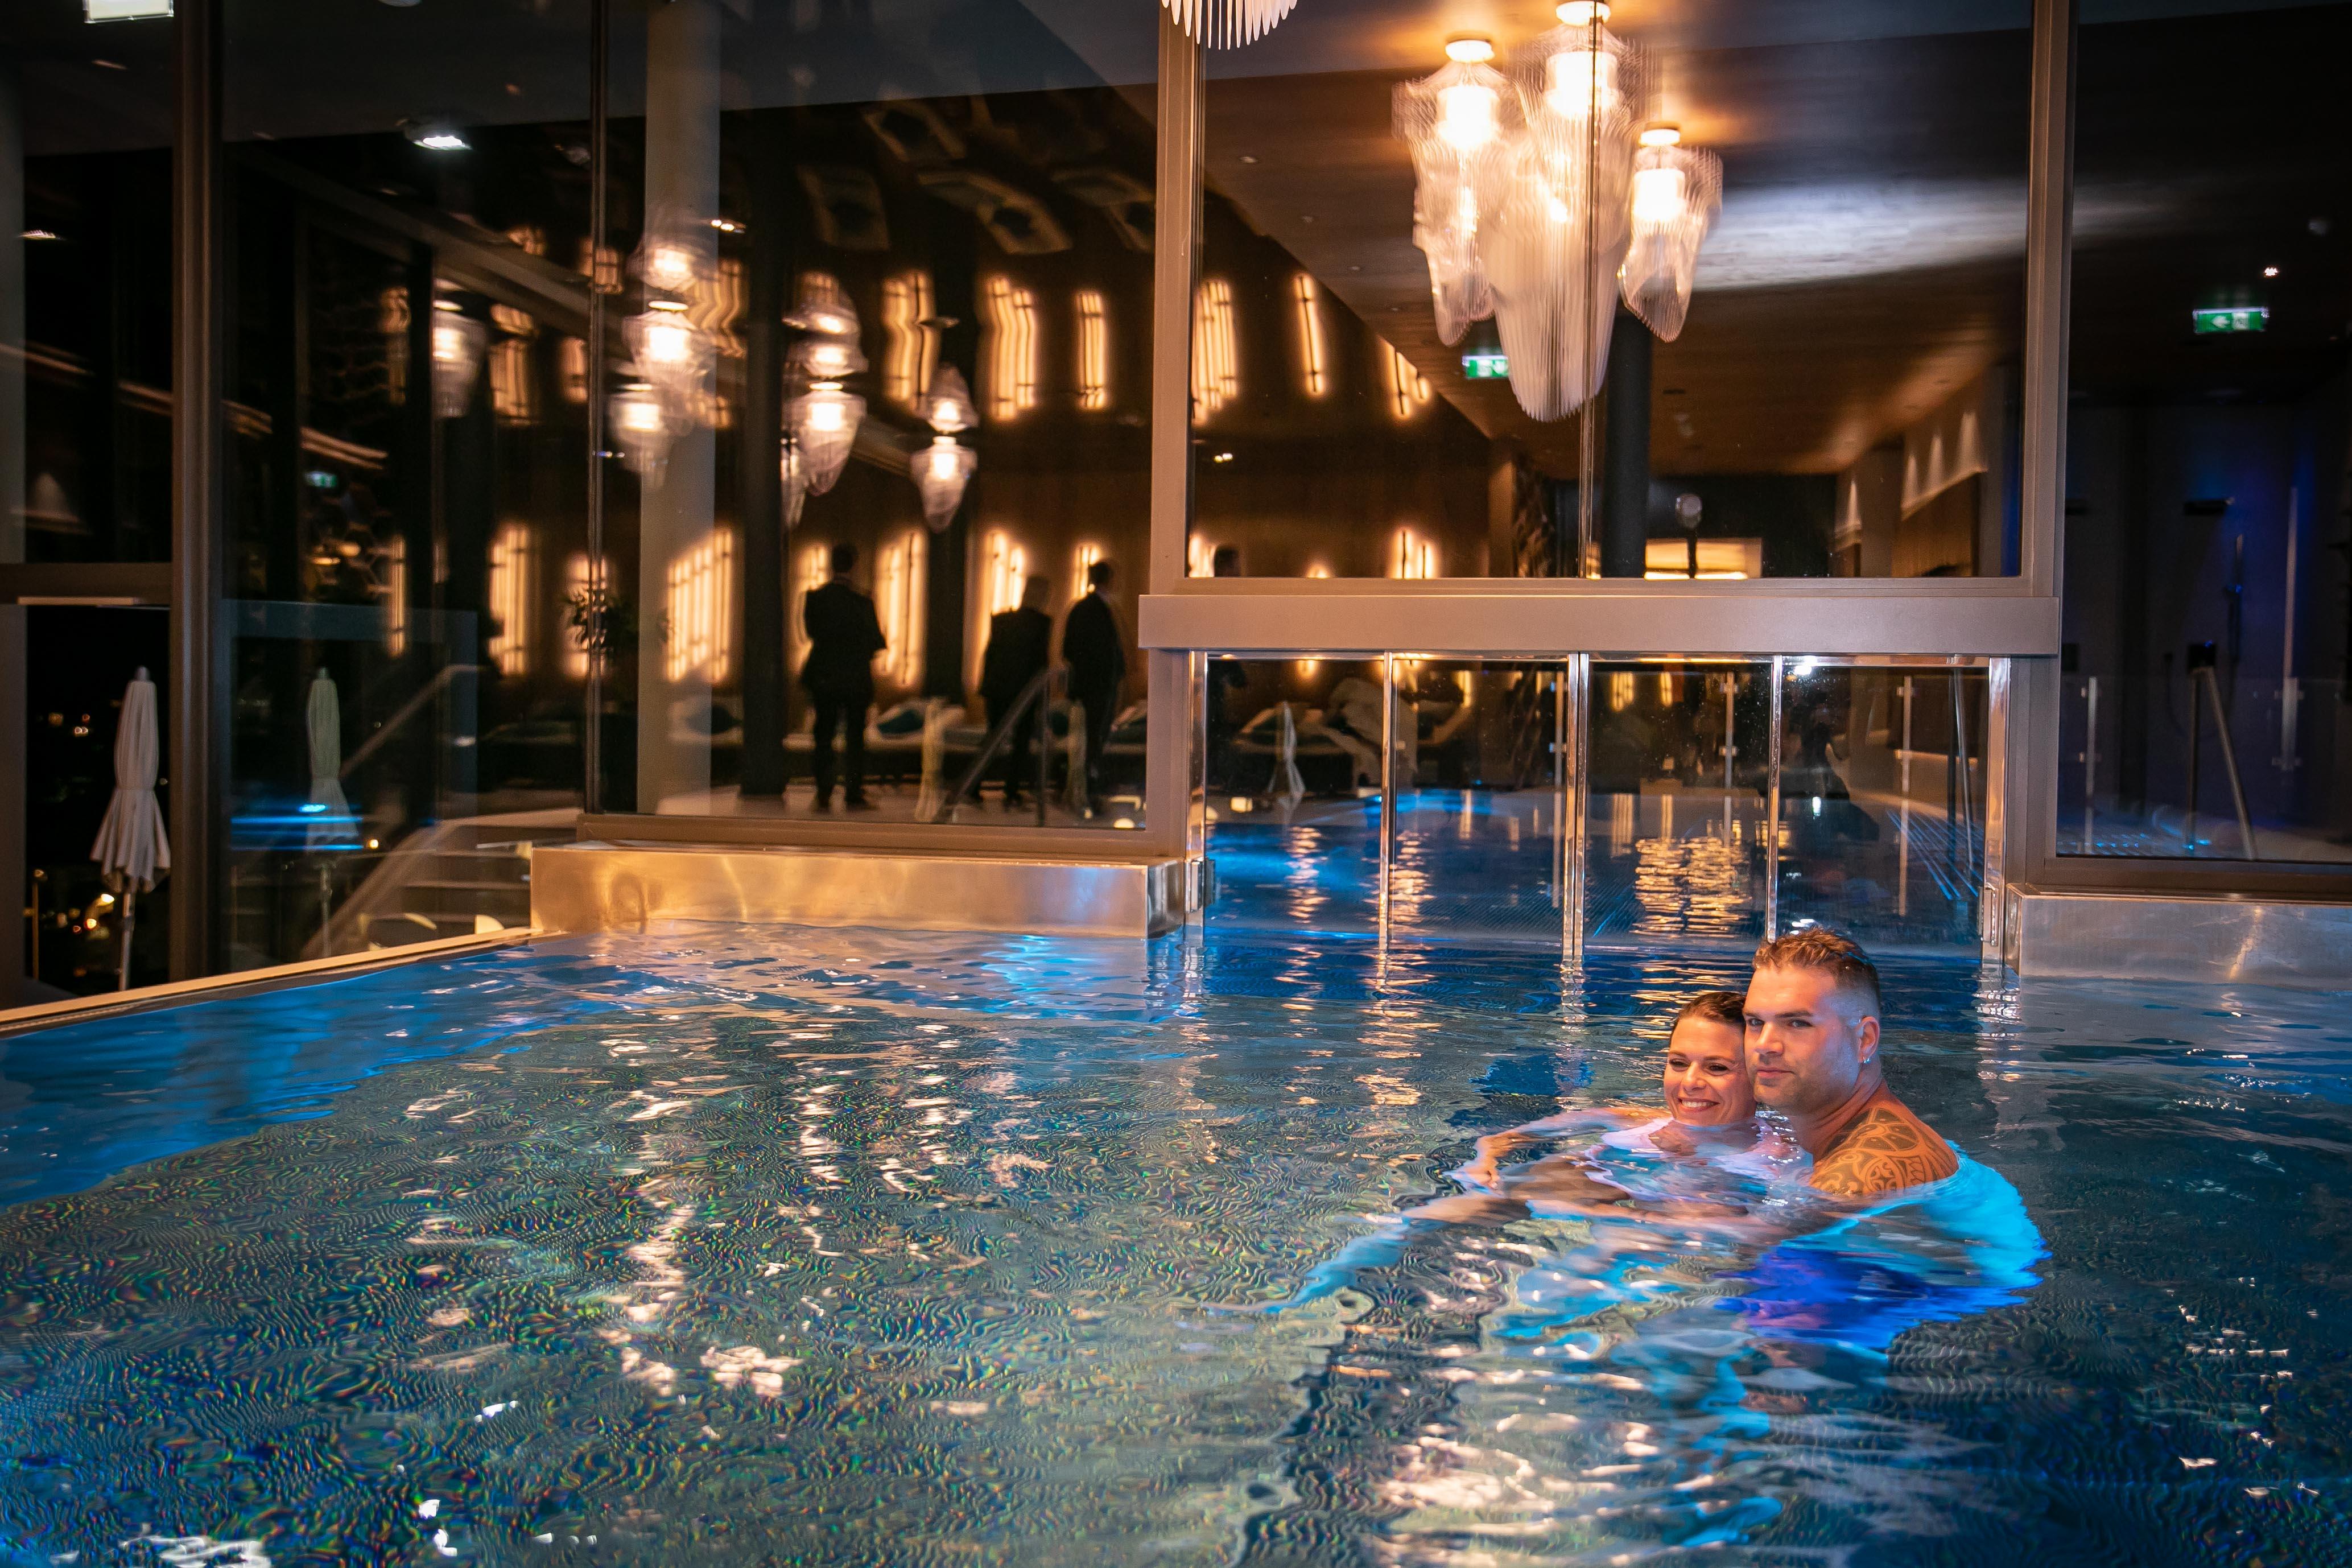 Indoor Pool, Hotel Edelweiss, Großarl ©www.wildbild.at